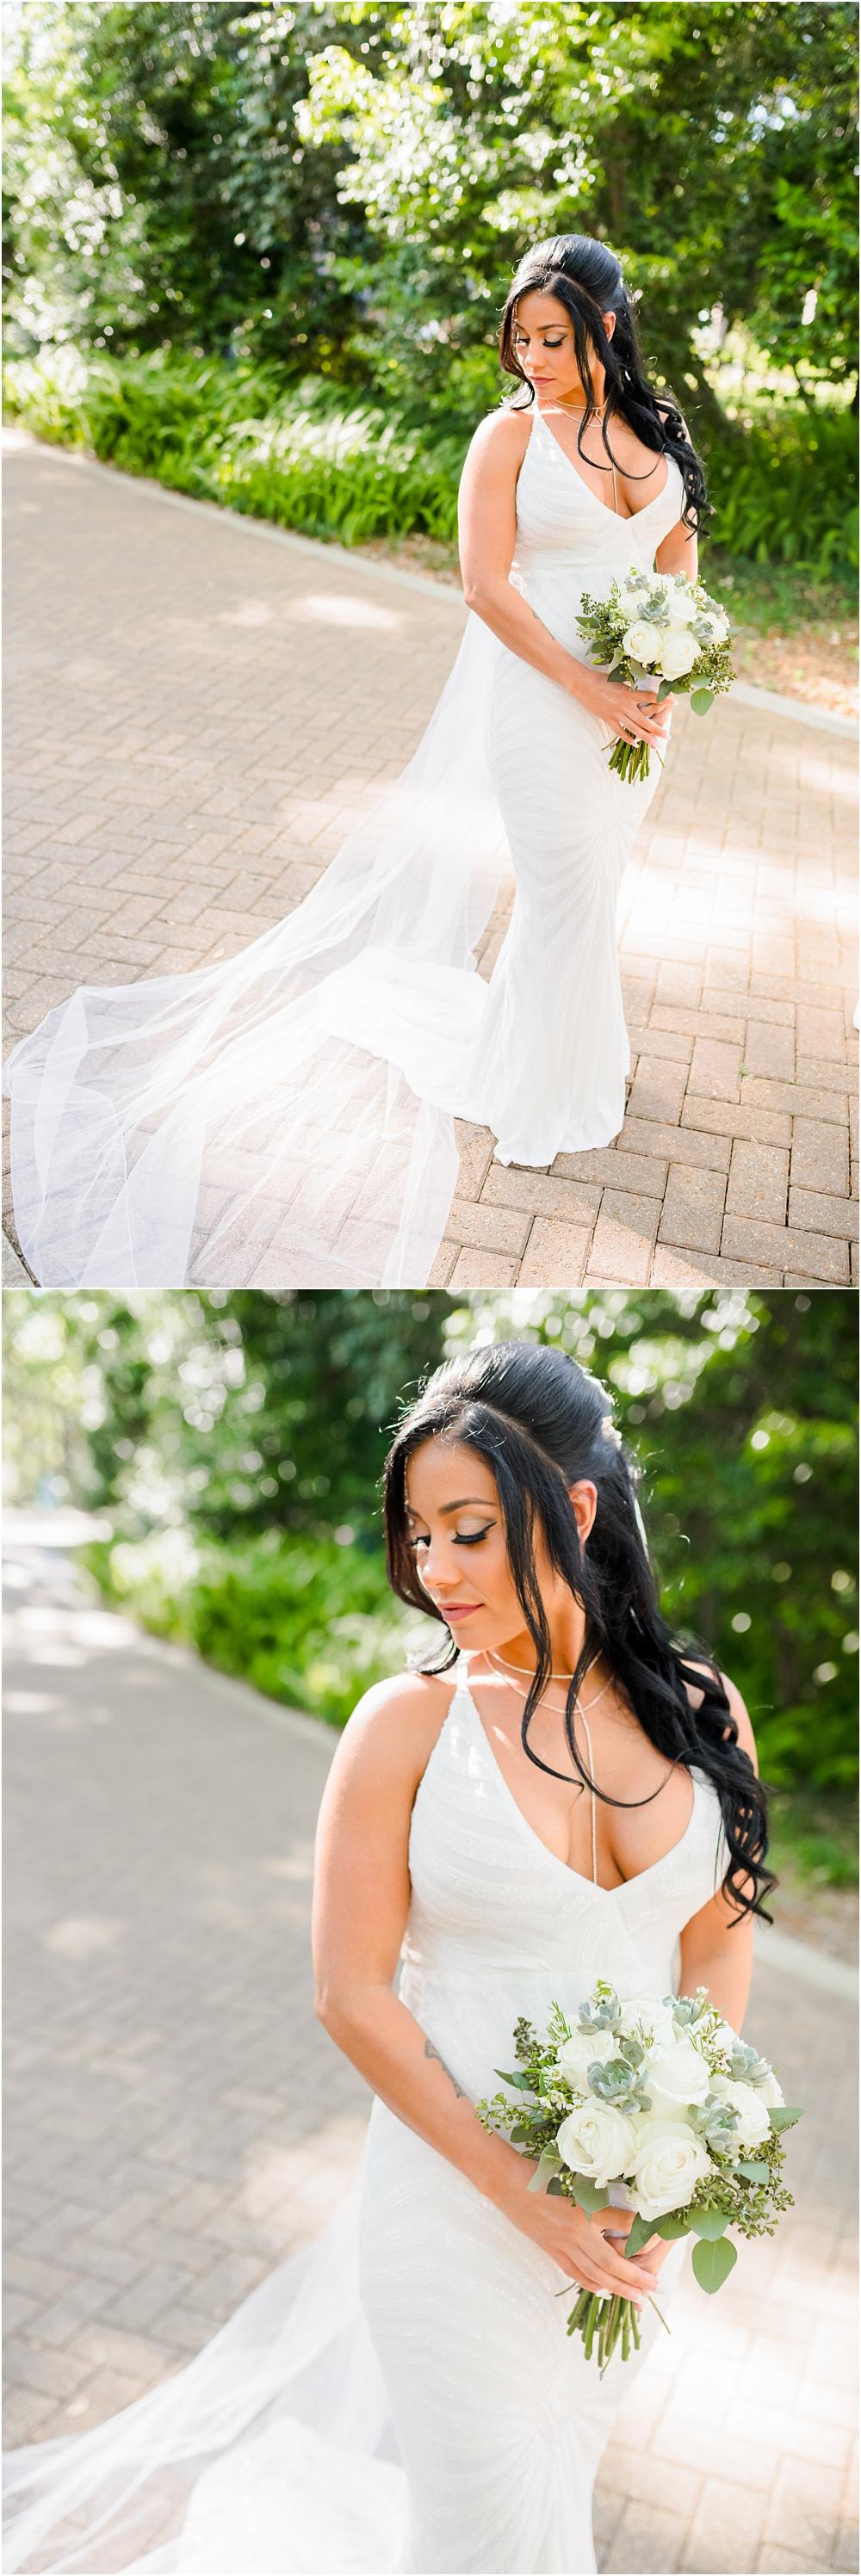 green-eden-gardens-florida-wedding-kiersten-stevenson-photography84.jpg